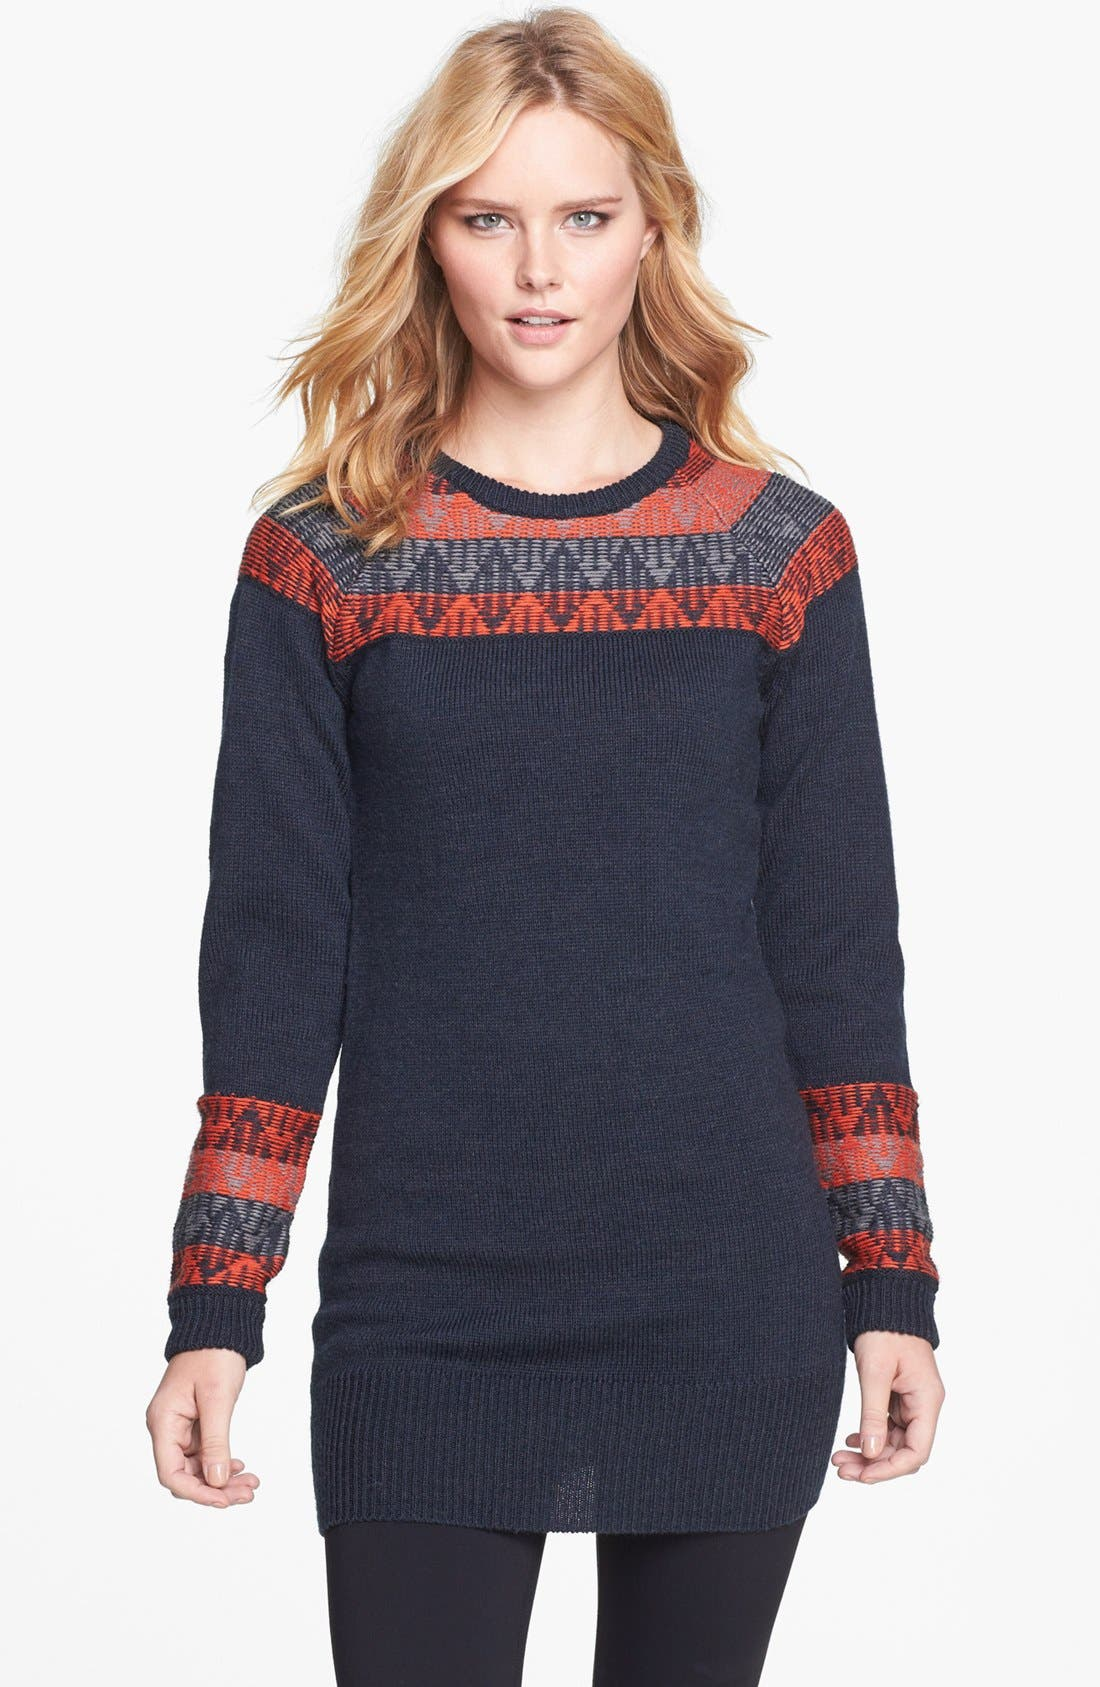 Alternate Image 1 Selected - Bench. 'Glaster' Sweater Dress